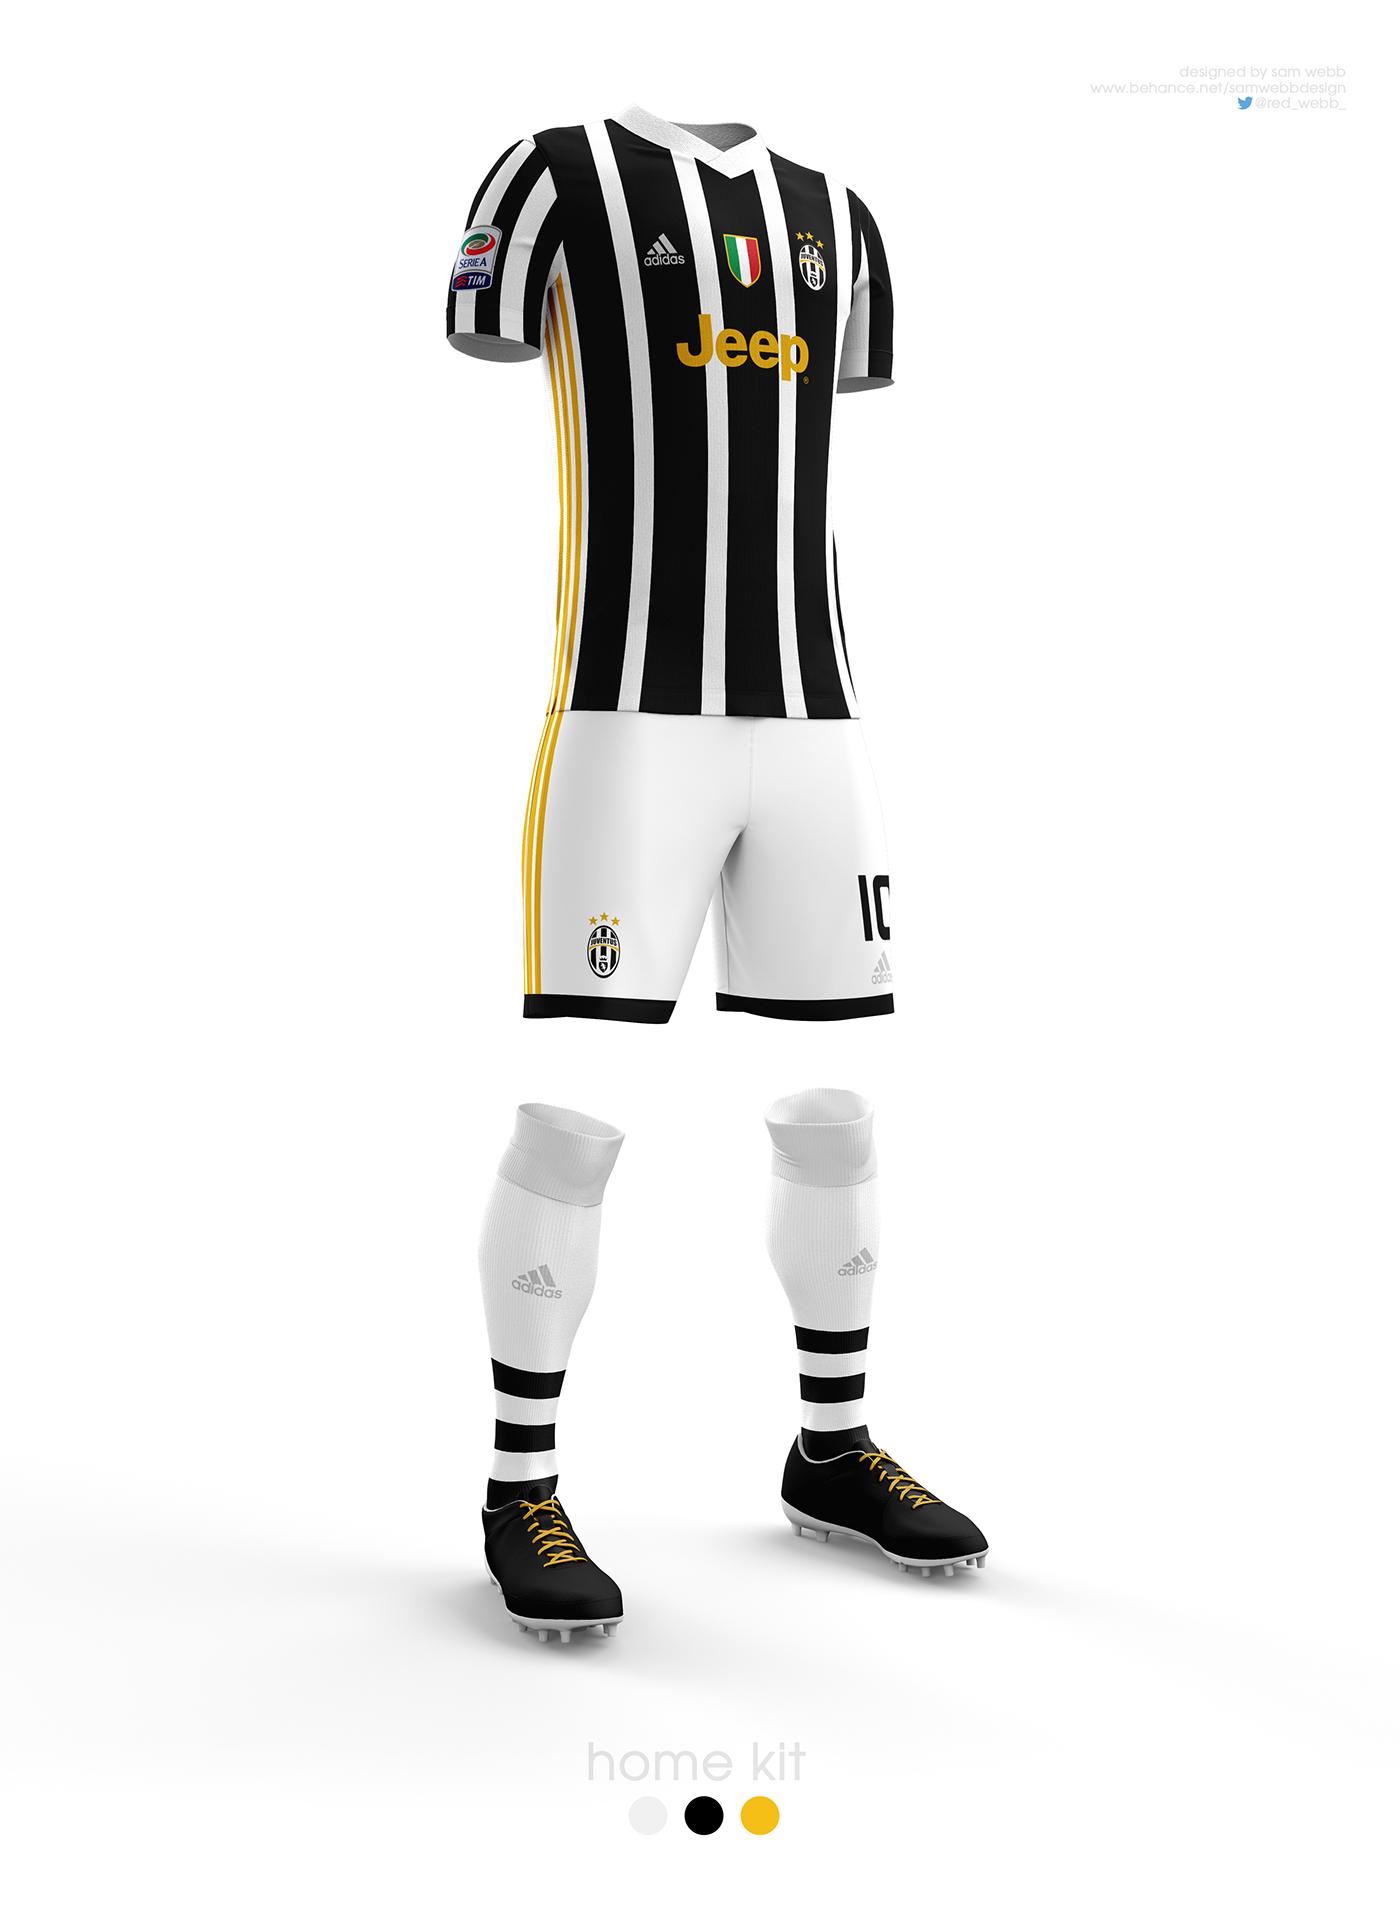 info for fe24a ea7e6 Juventus FC Kit Designs 16/17 on Behance